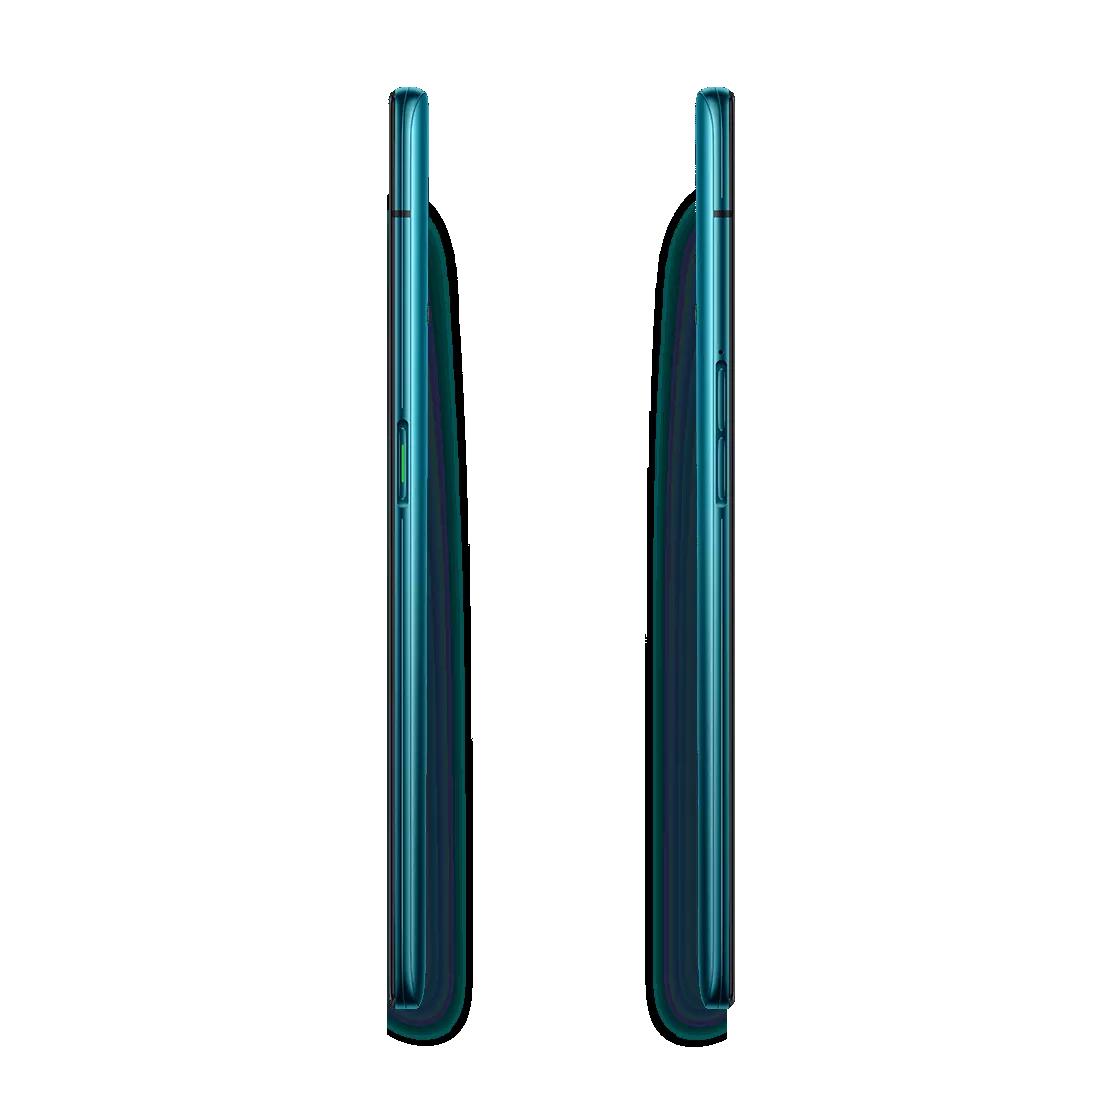 OPPO представила флагманский Reno в двух версиях5